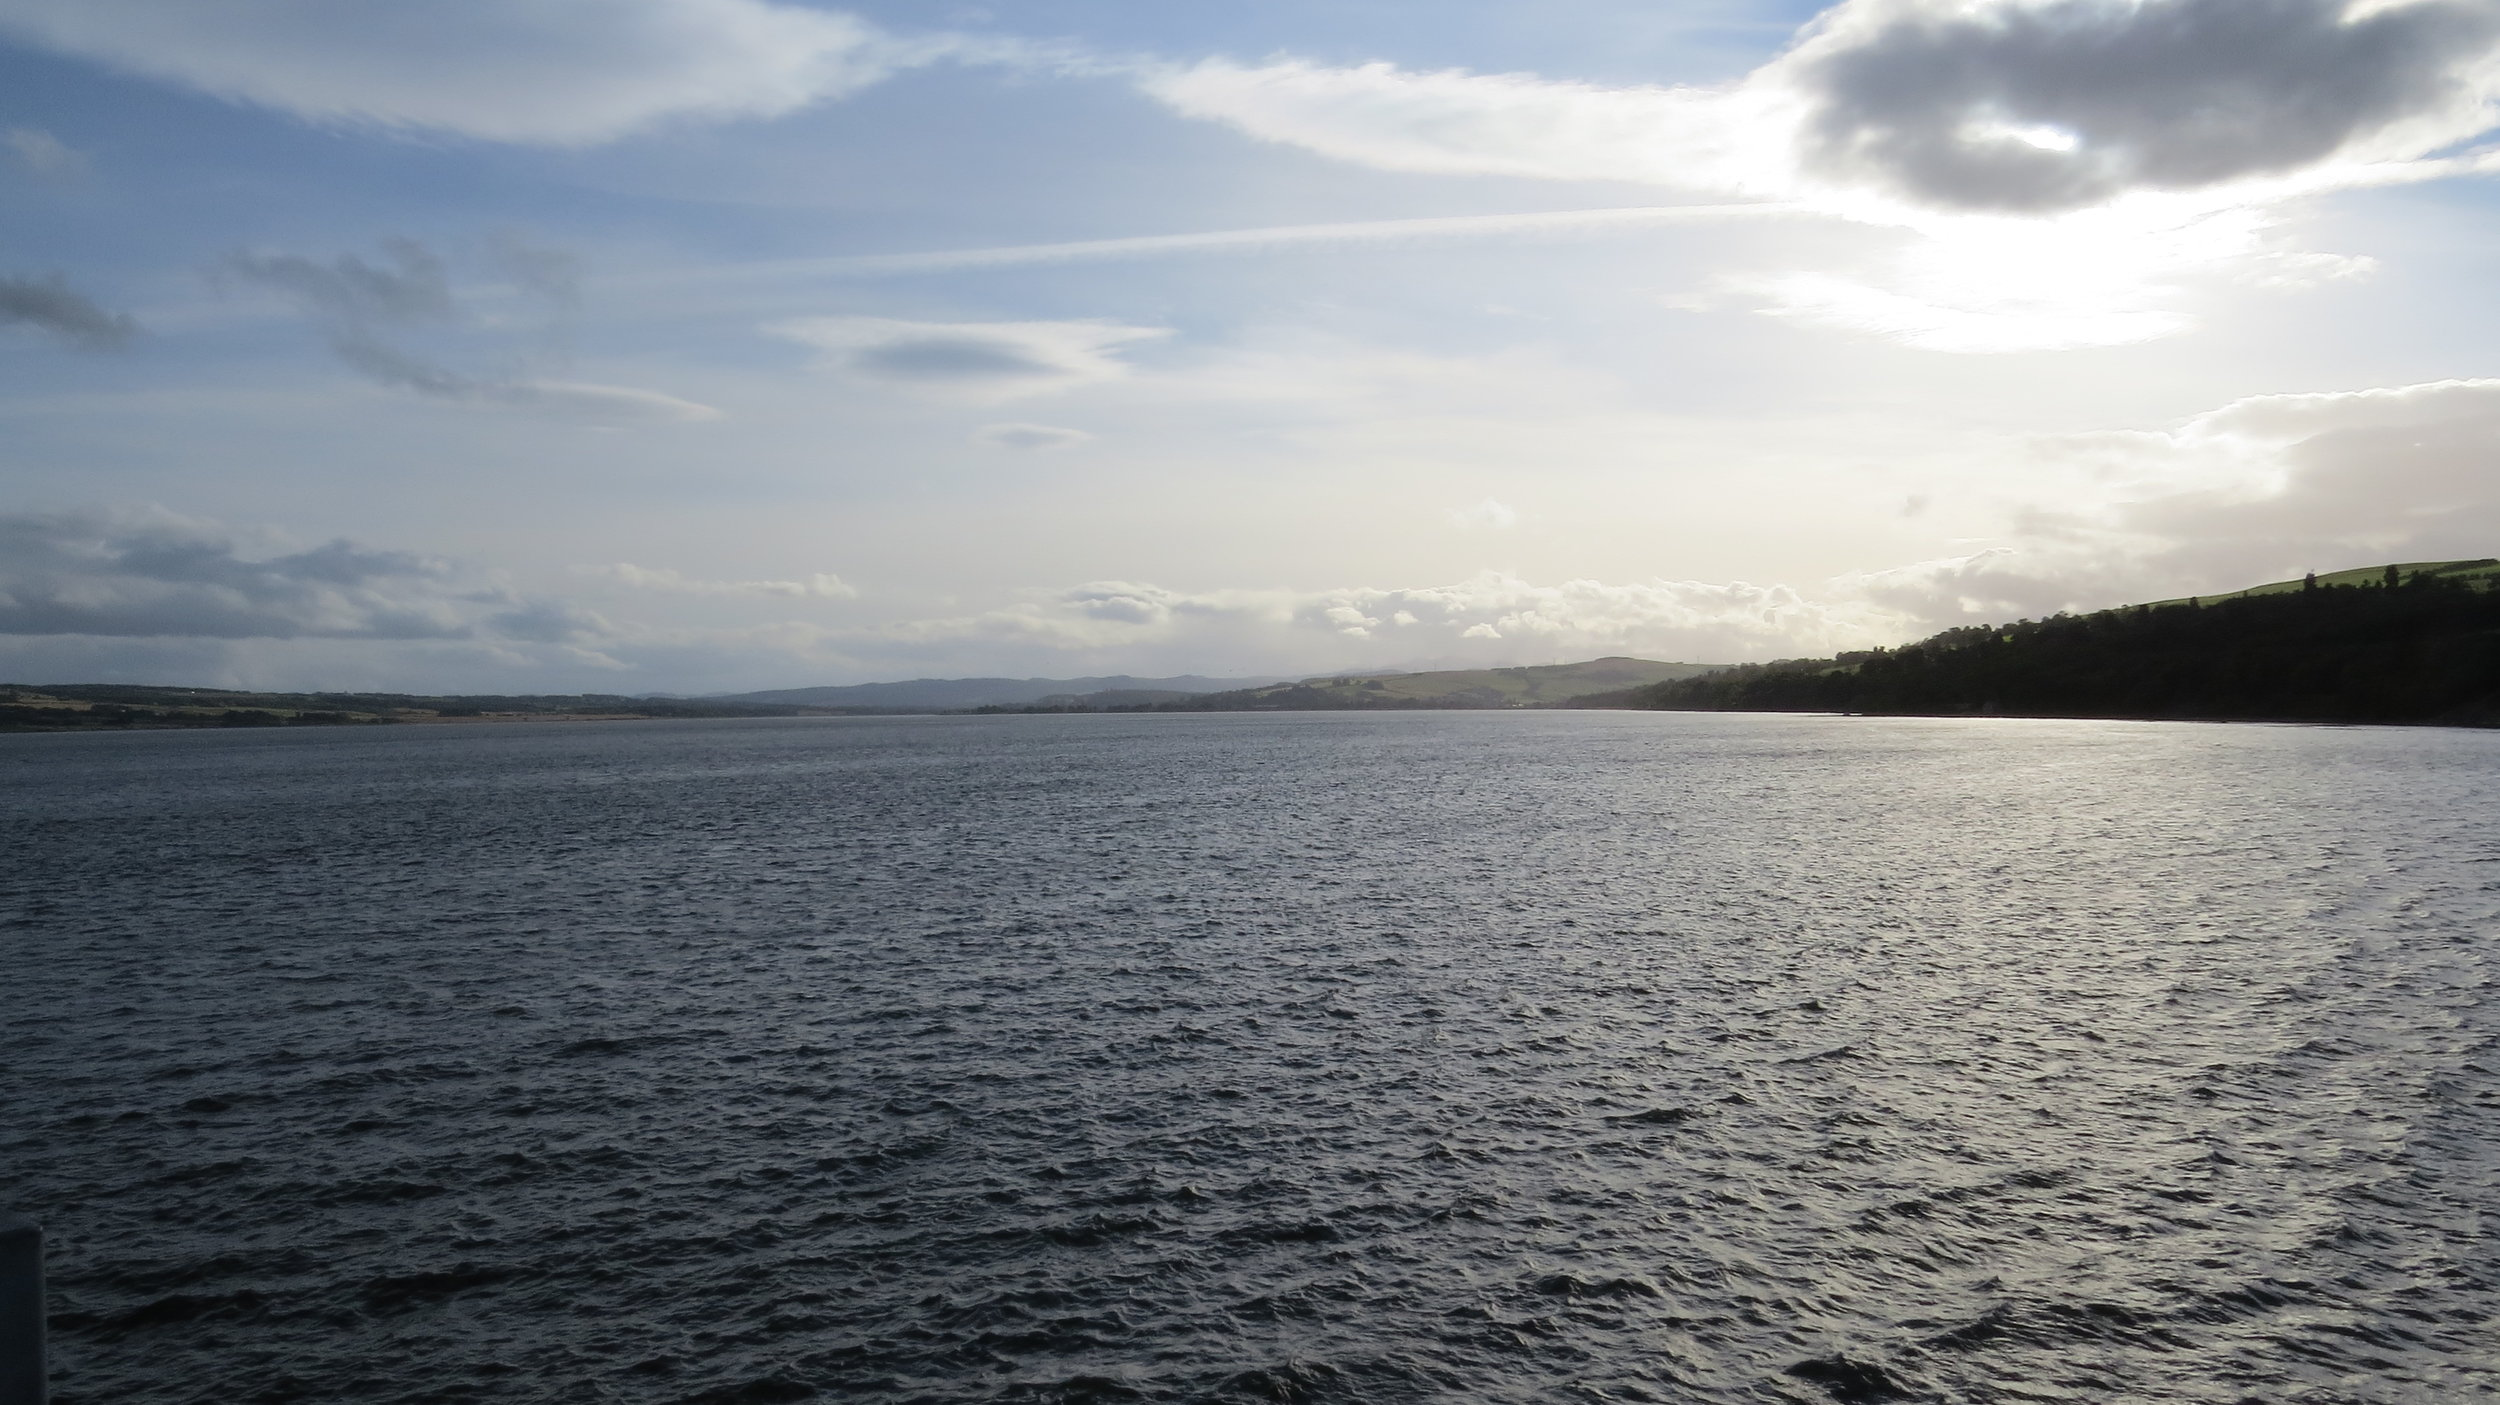 View from Cromarty Bridge